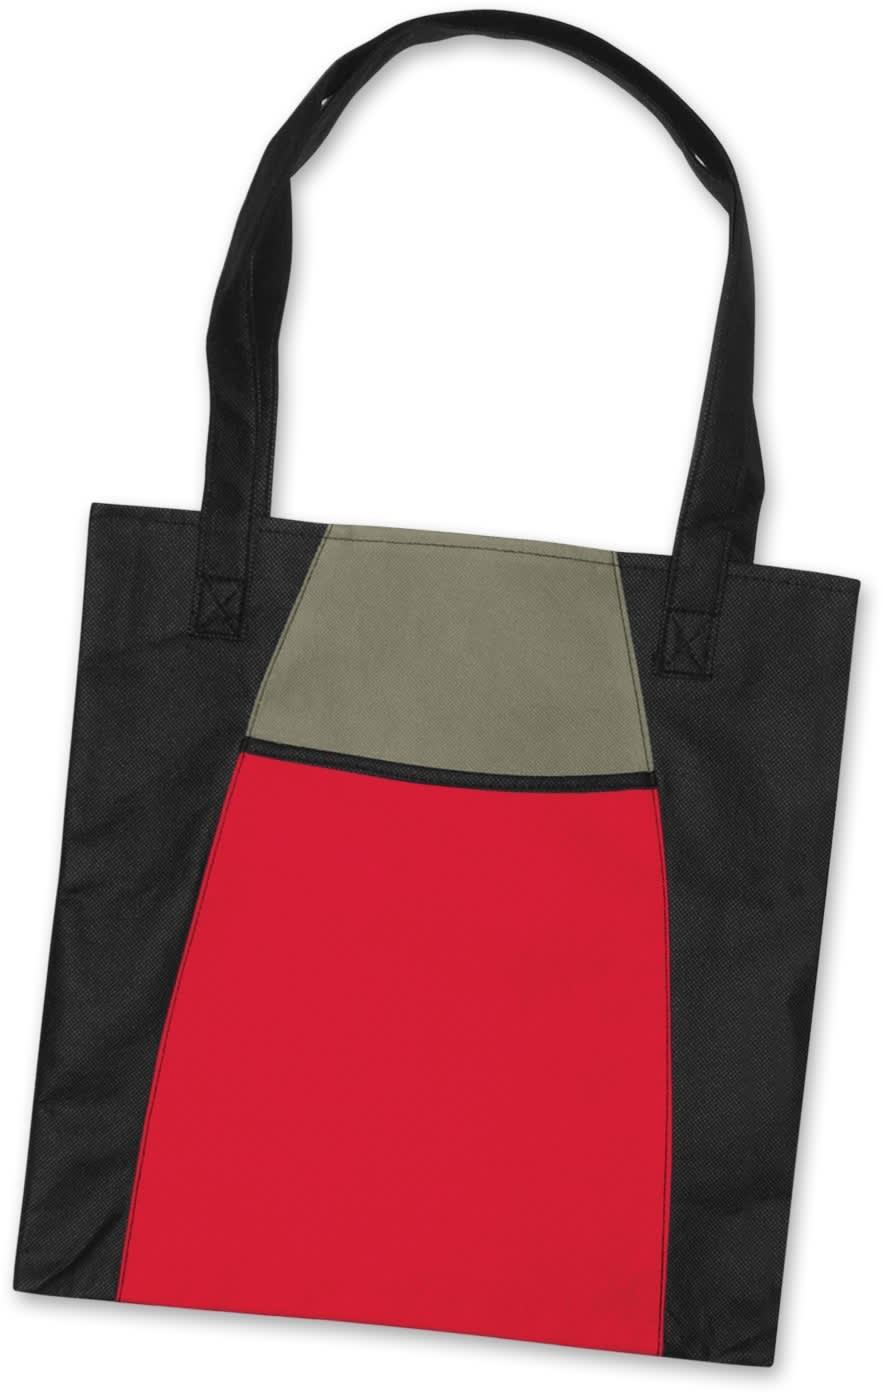 Red/Black Promo Fashionable Tote Bag